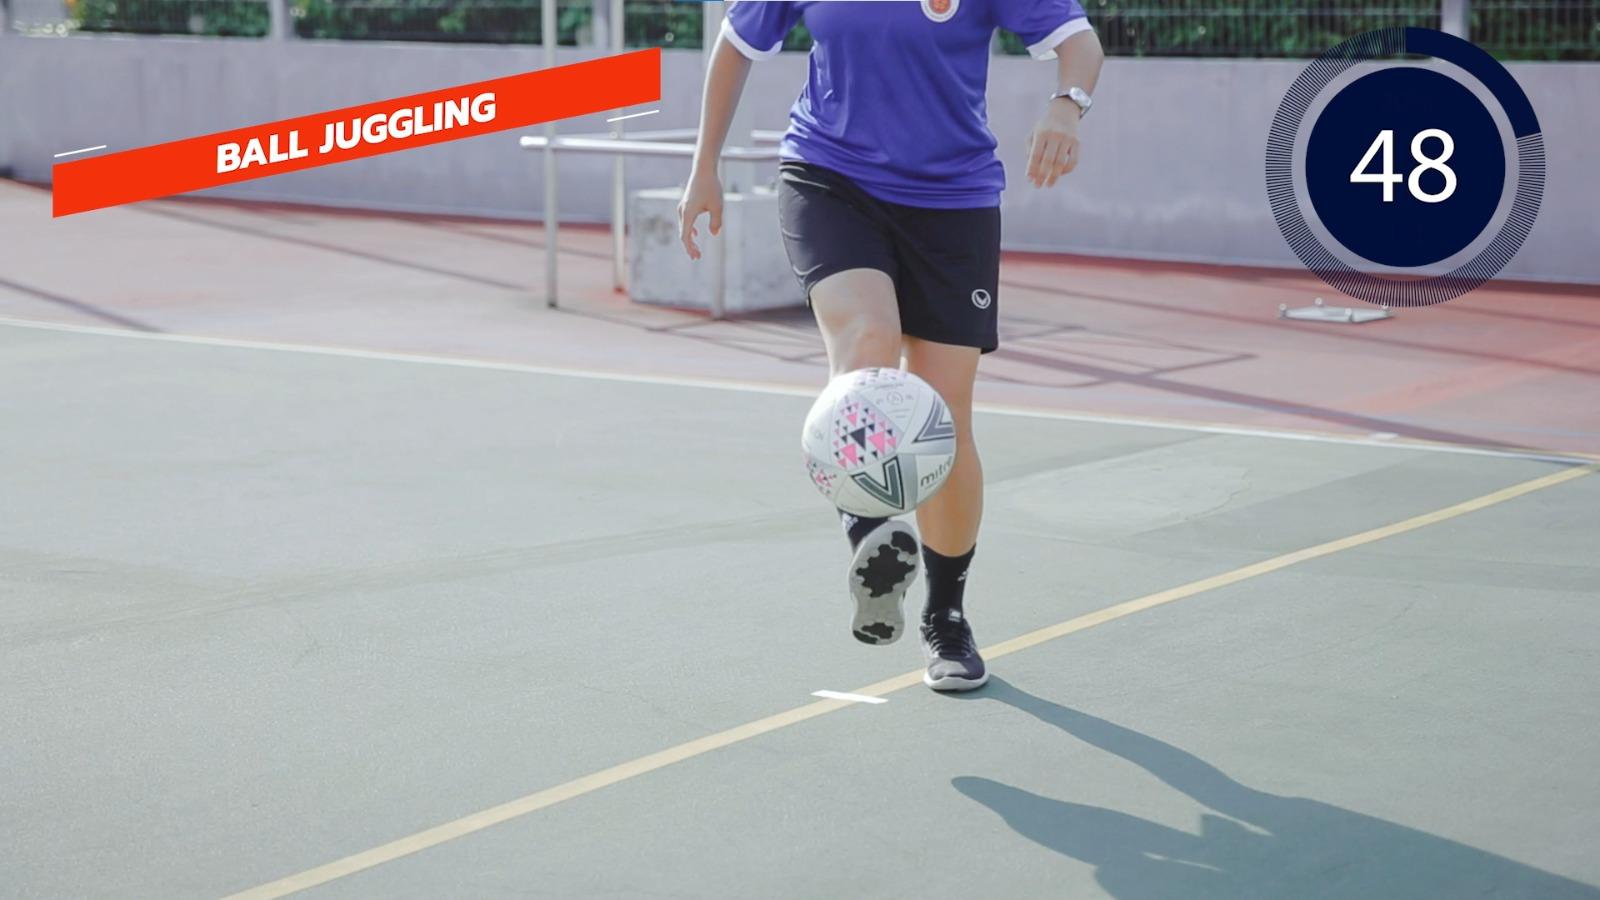 football - ball juggling